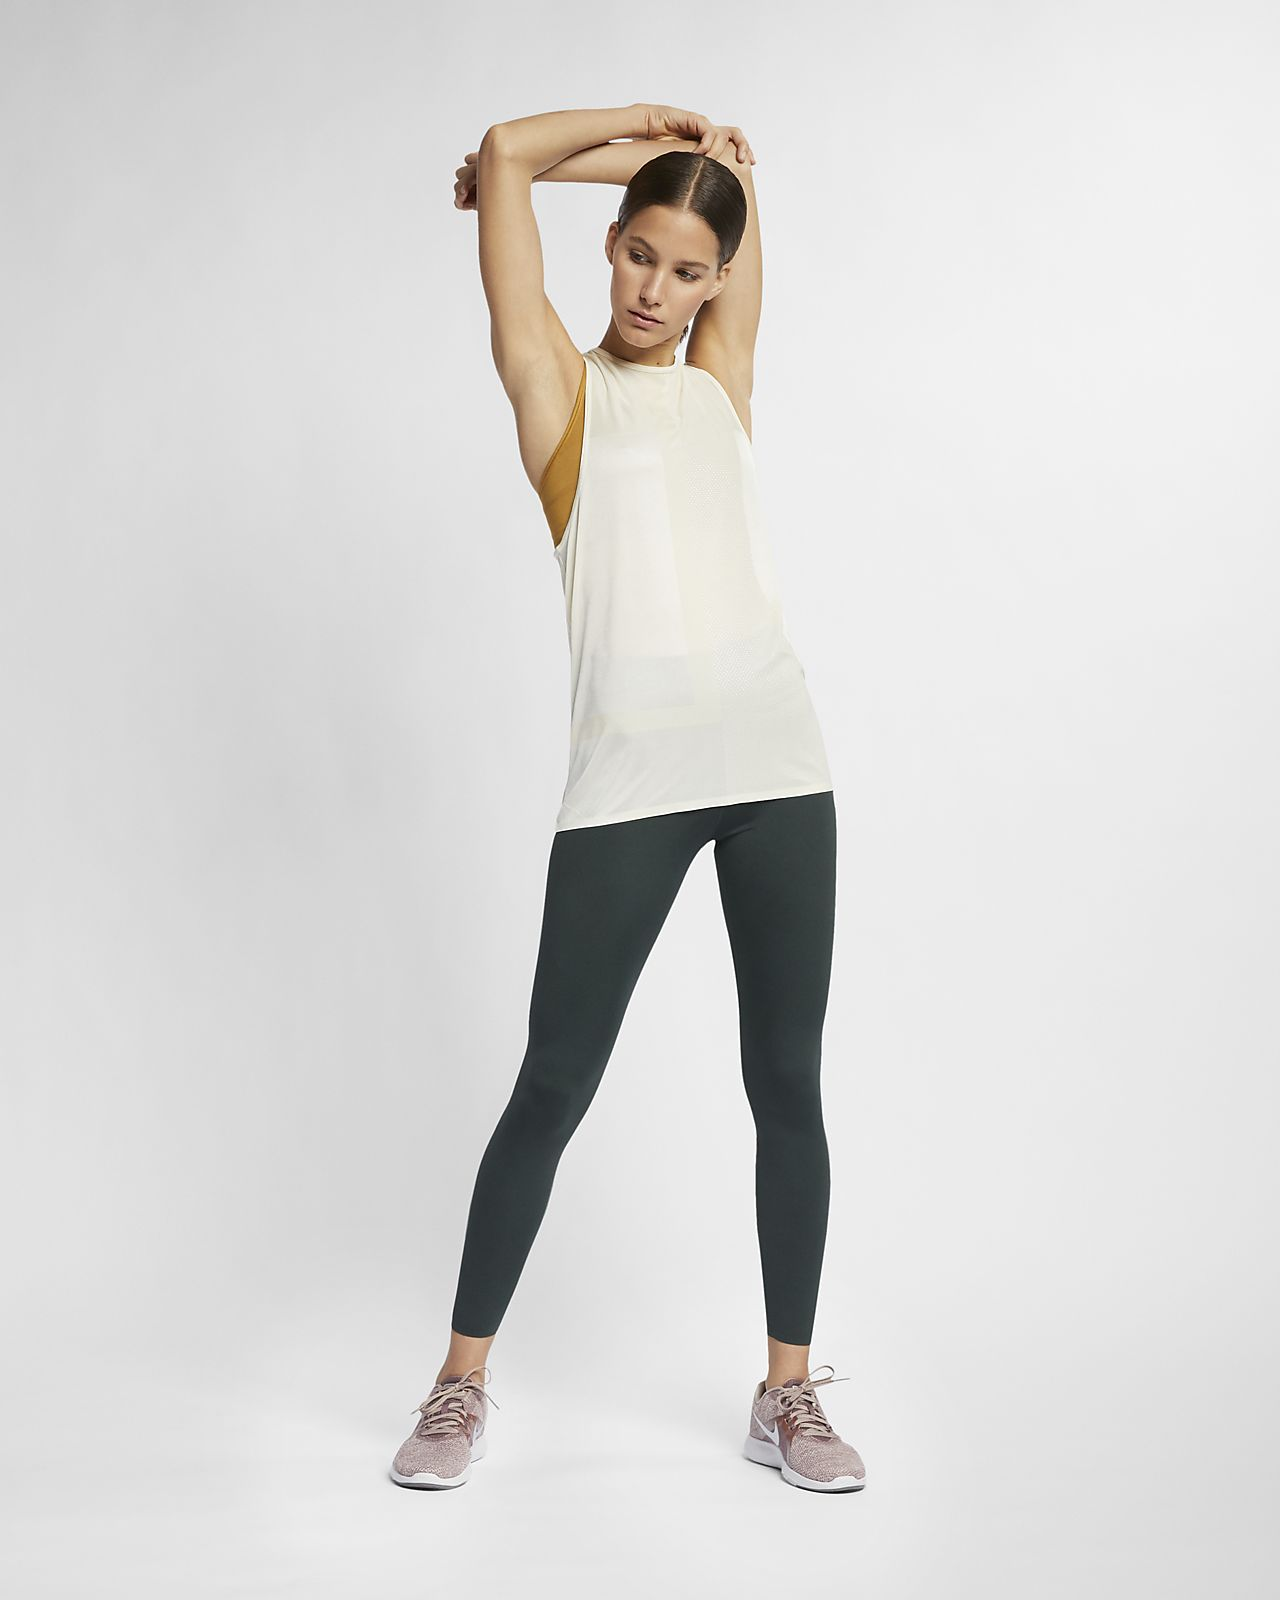 Canotta De Entrenamiento Punto Nike Donna Da qUzVpGSM